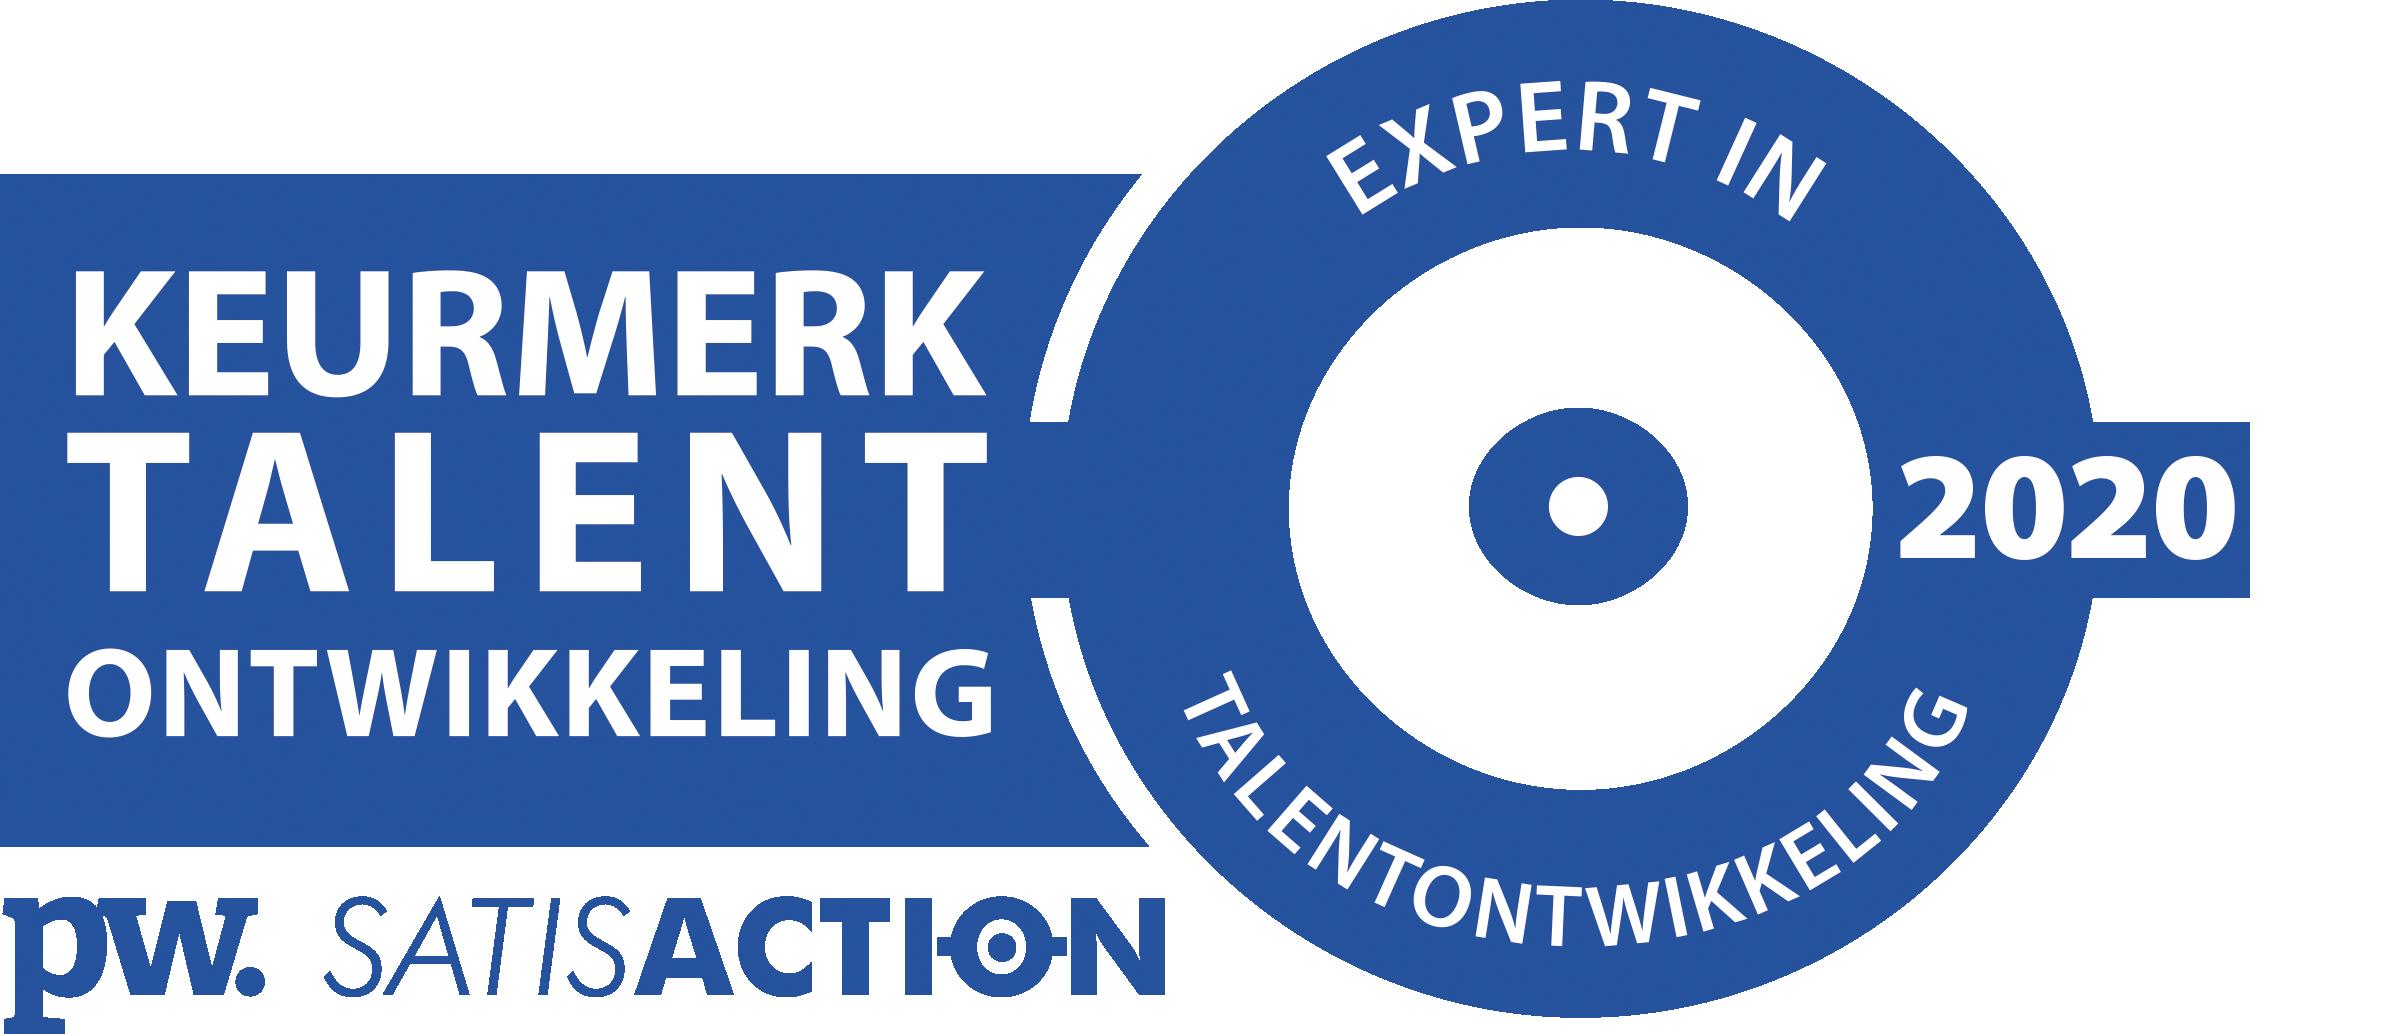 Keurmerk_Talentontwikkeling_NL_2020